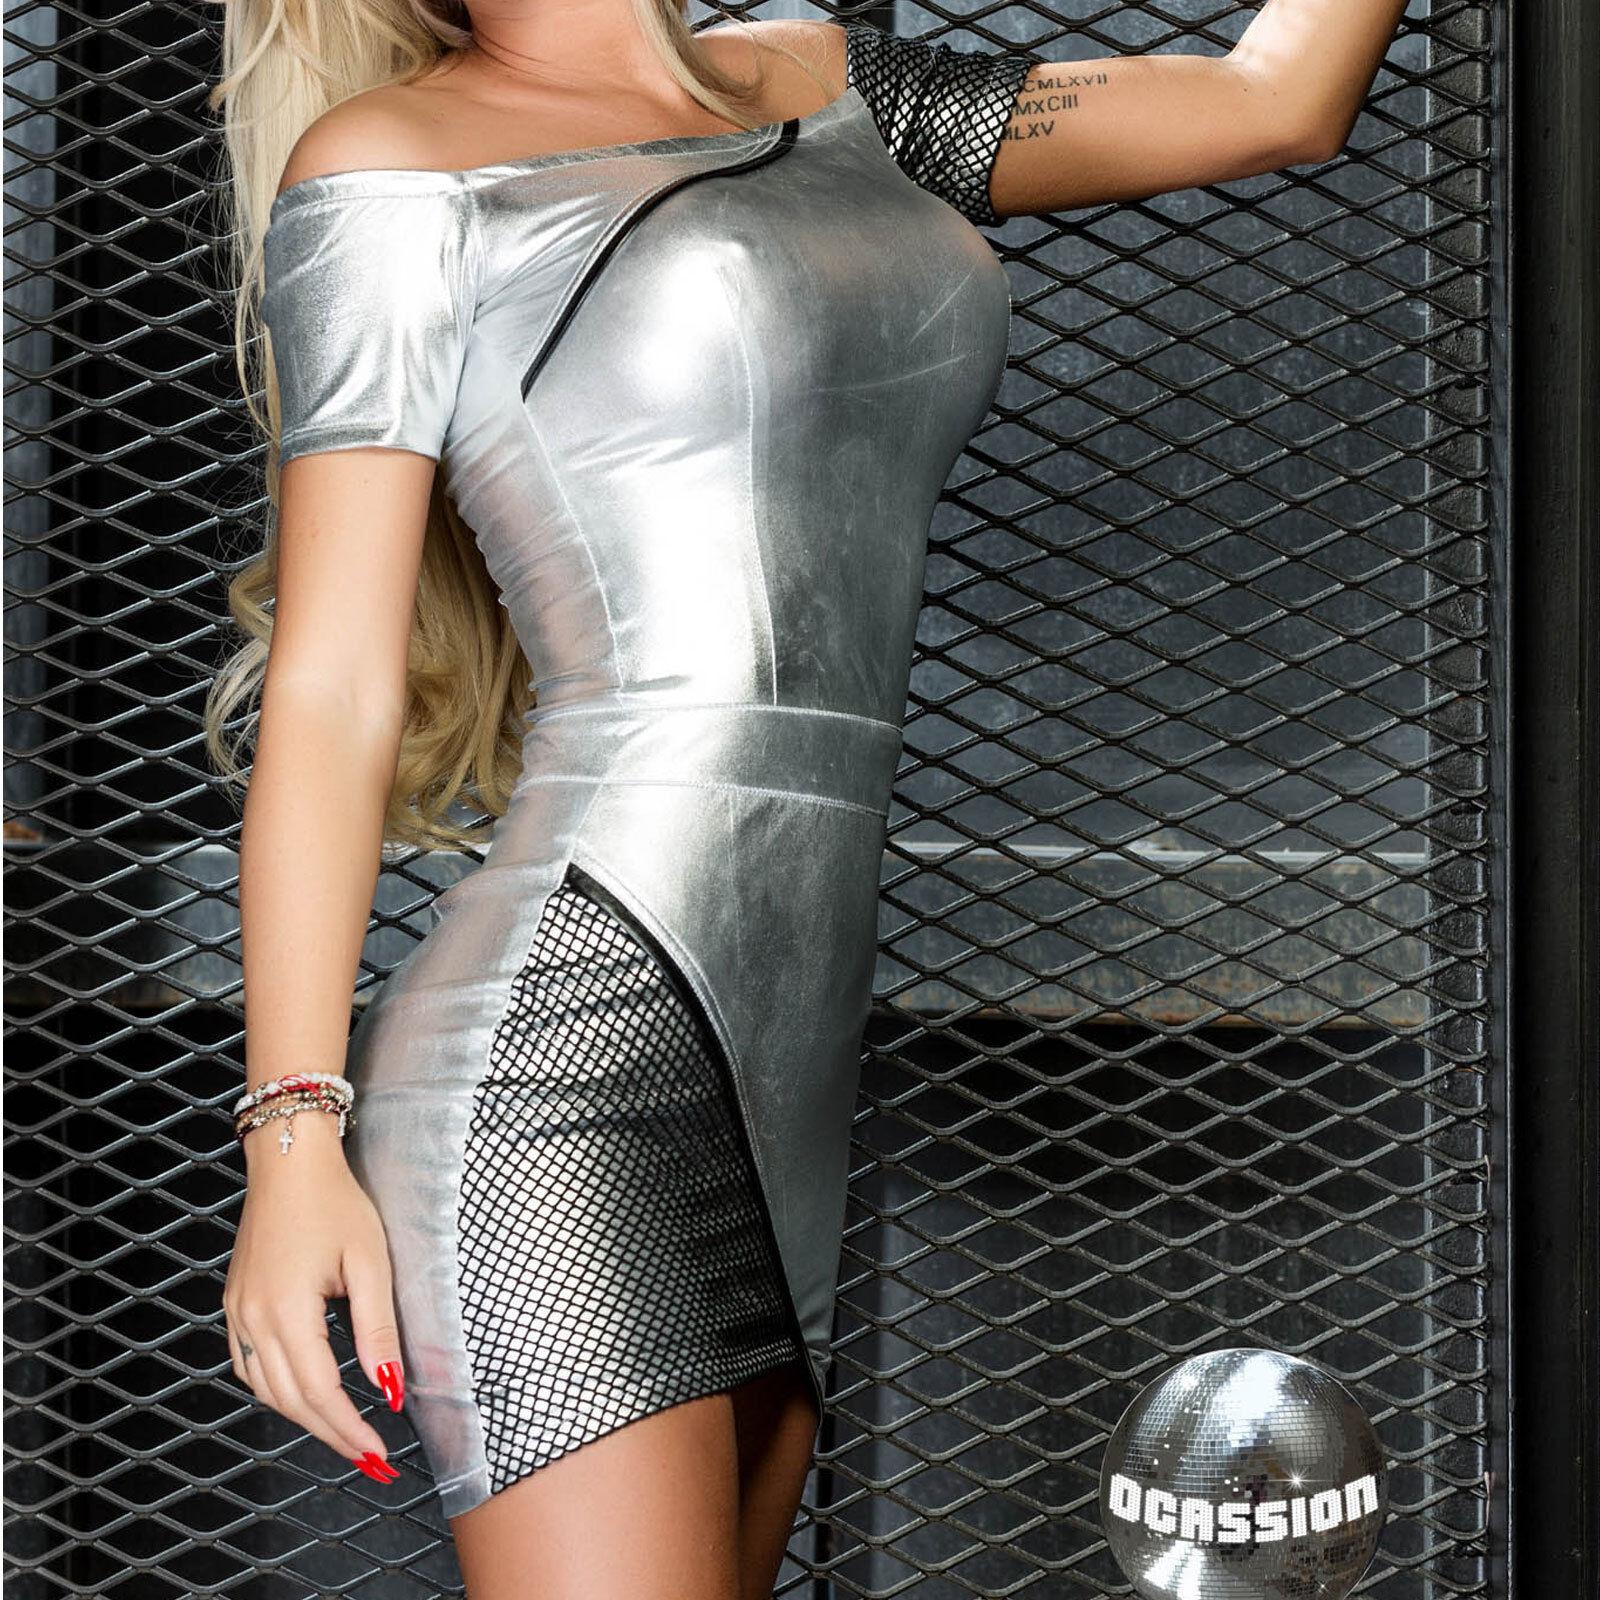 Ocassion Partykleid Lederlook Minikleid Bodycon-Kleid Wetlook metallic silver